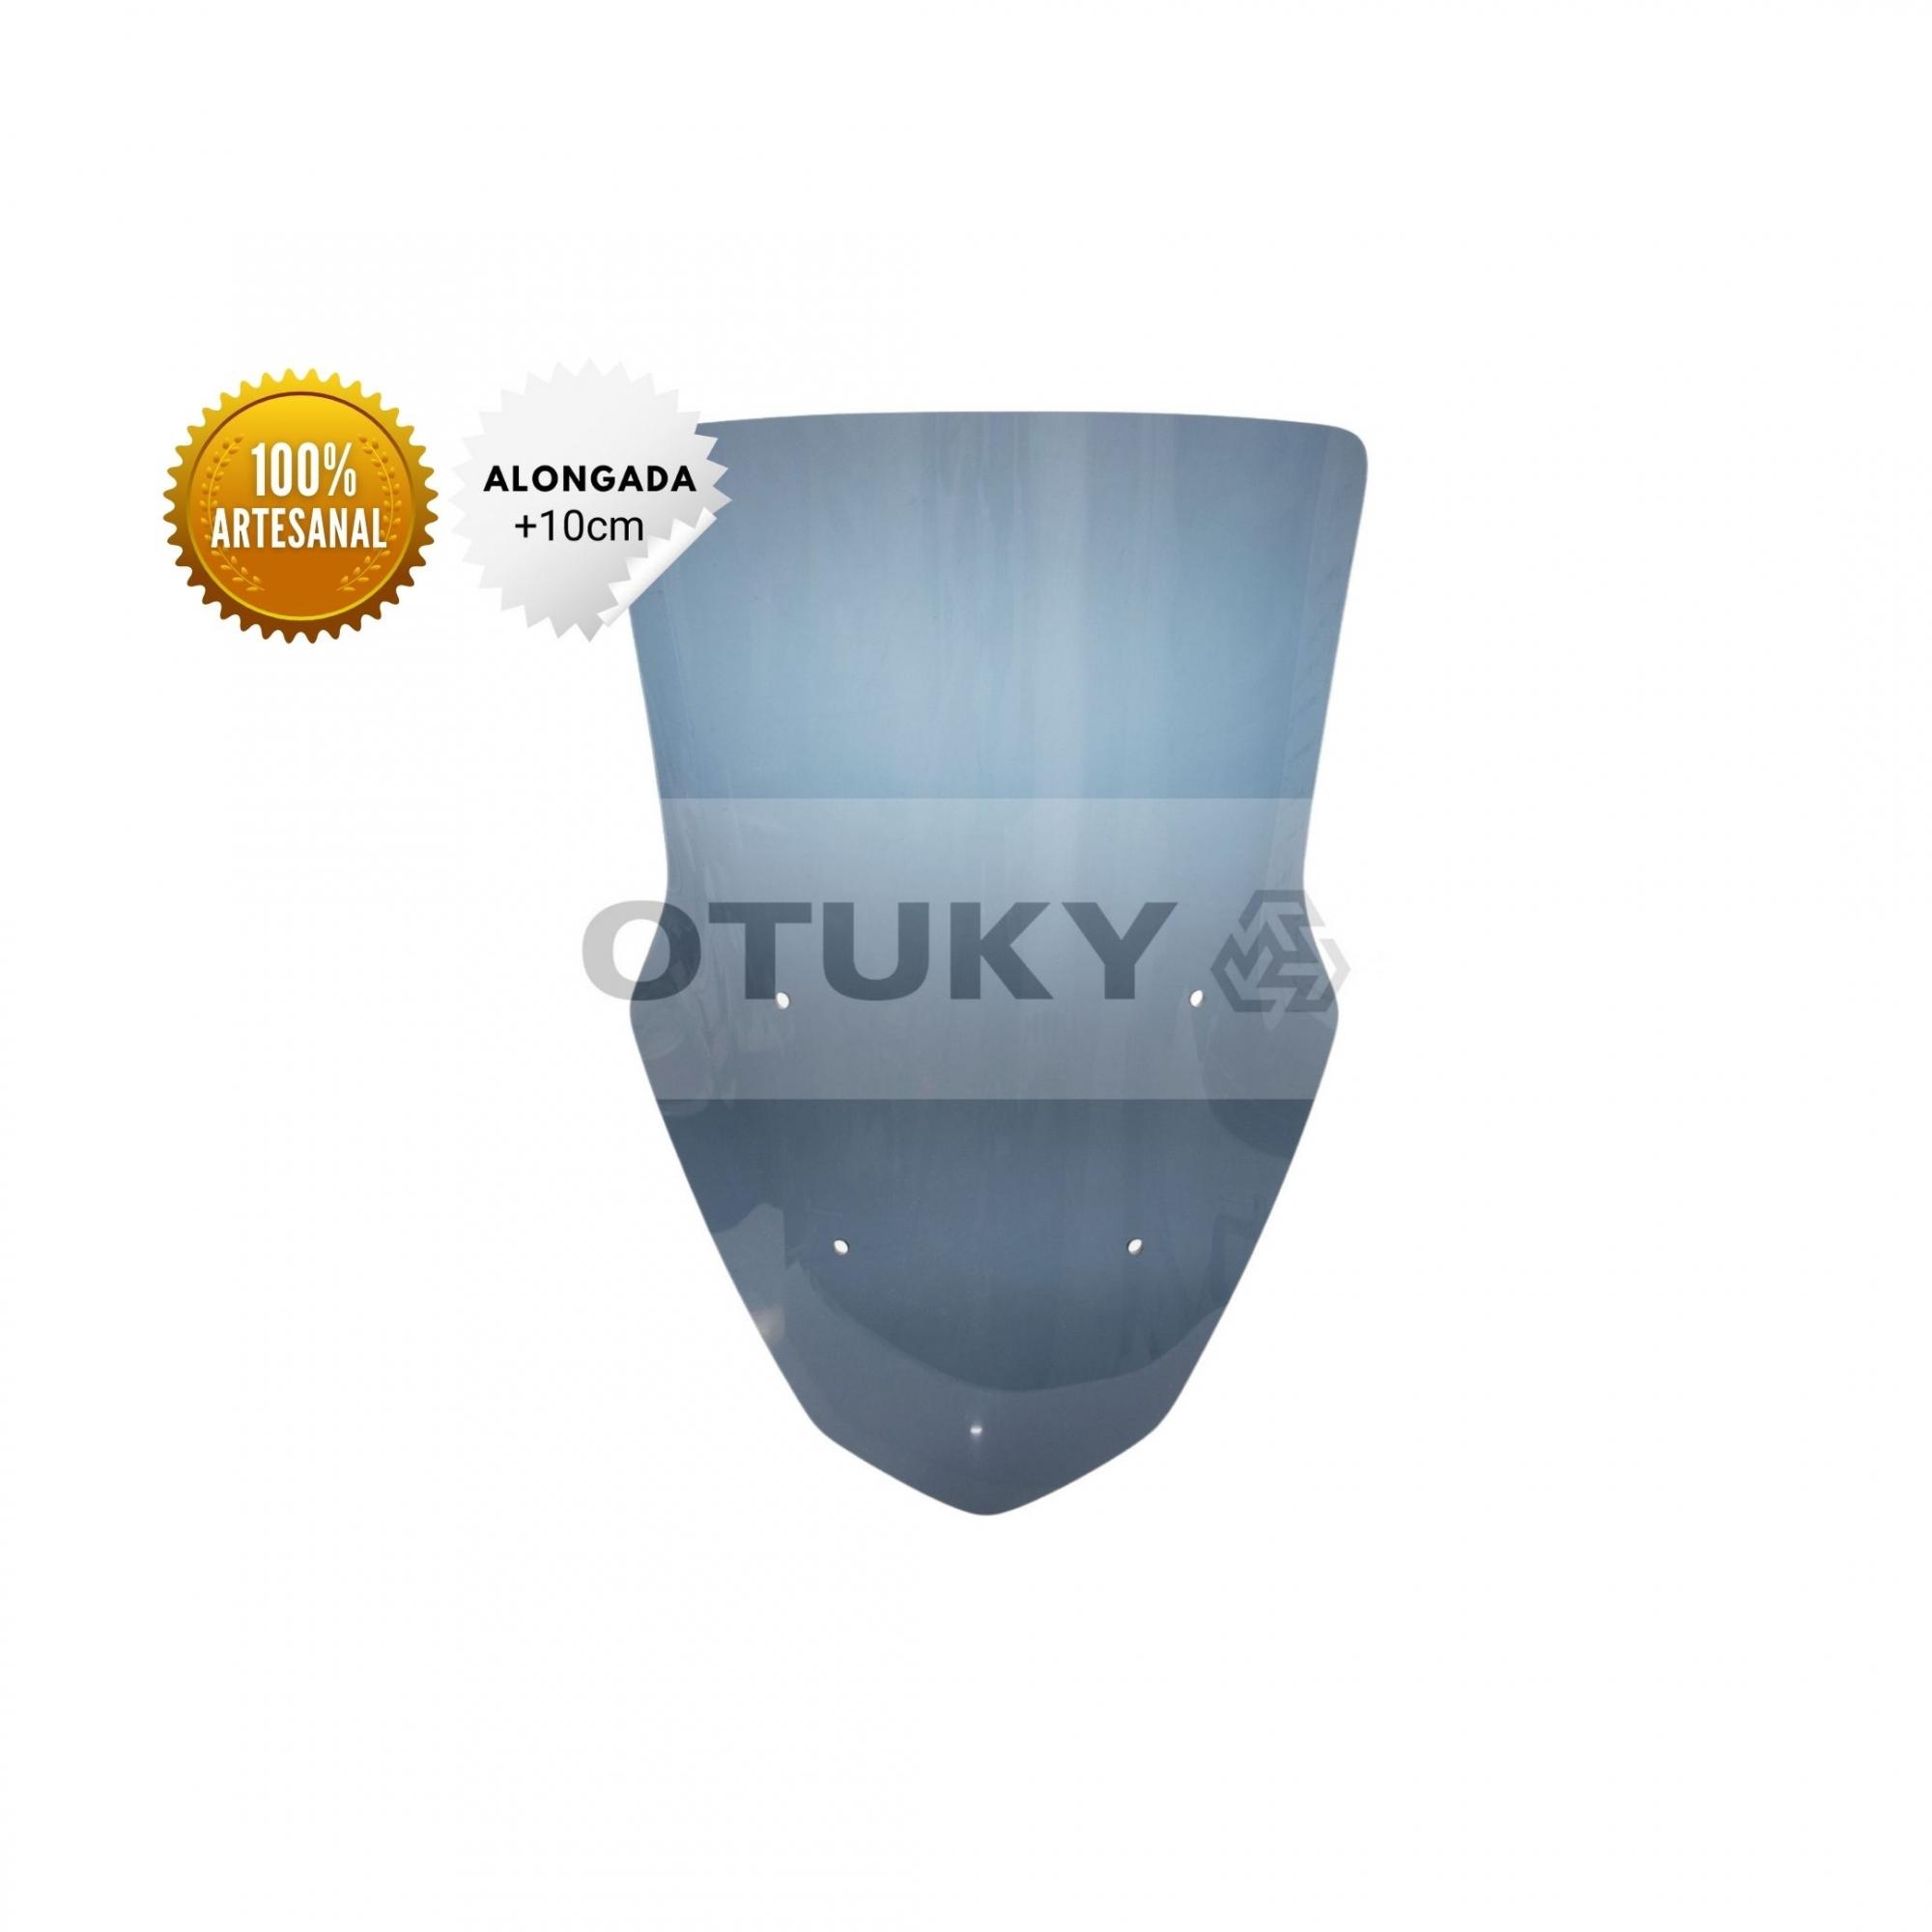 Bolha para Moto Nmax 160 2017 2018 2019 2020 Otuky Alongada Fumê Escuro